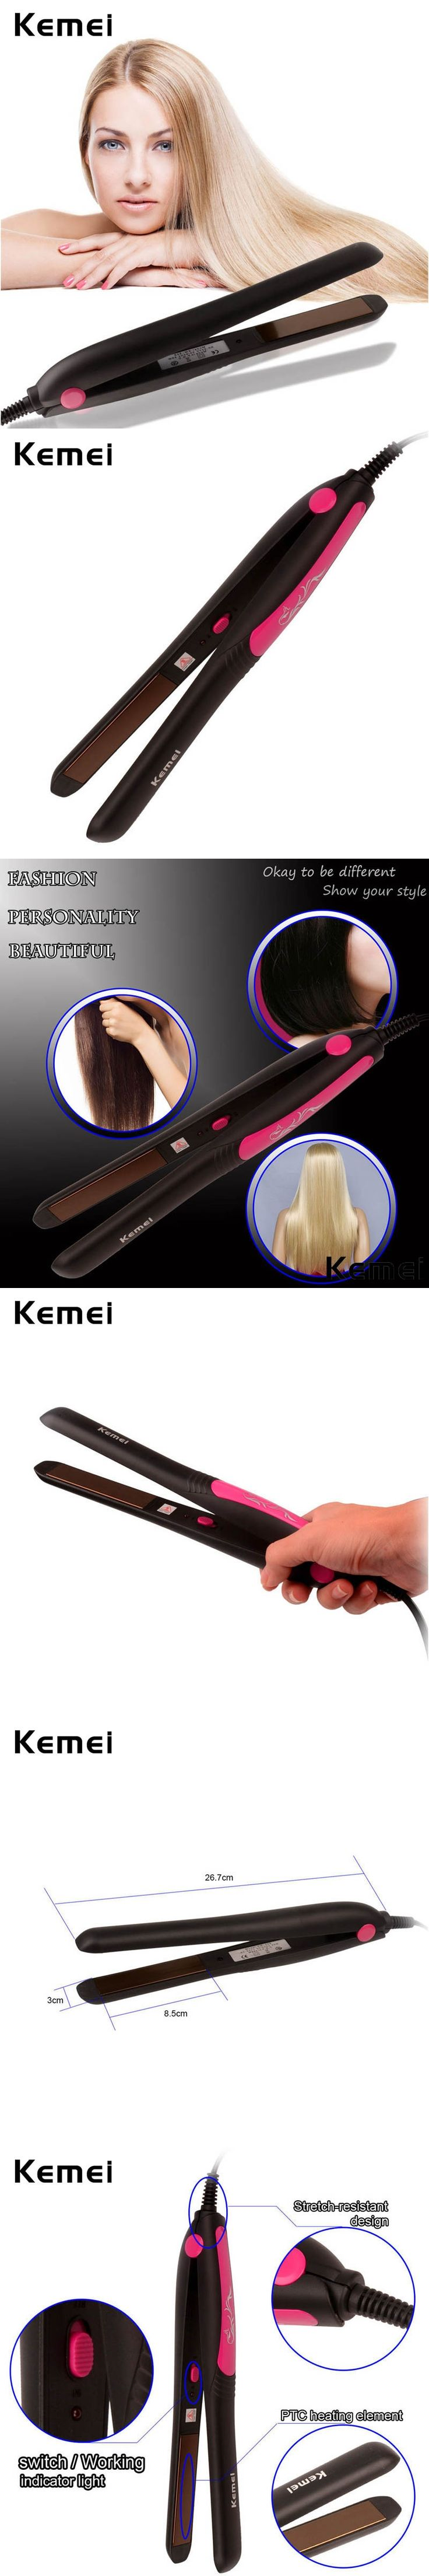 110-240V Kemei Professional Ceramic Flat iron Hair Straightening Curling iron Styler Tools Hair Straightener Dry &Wet Hair Plate